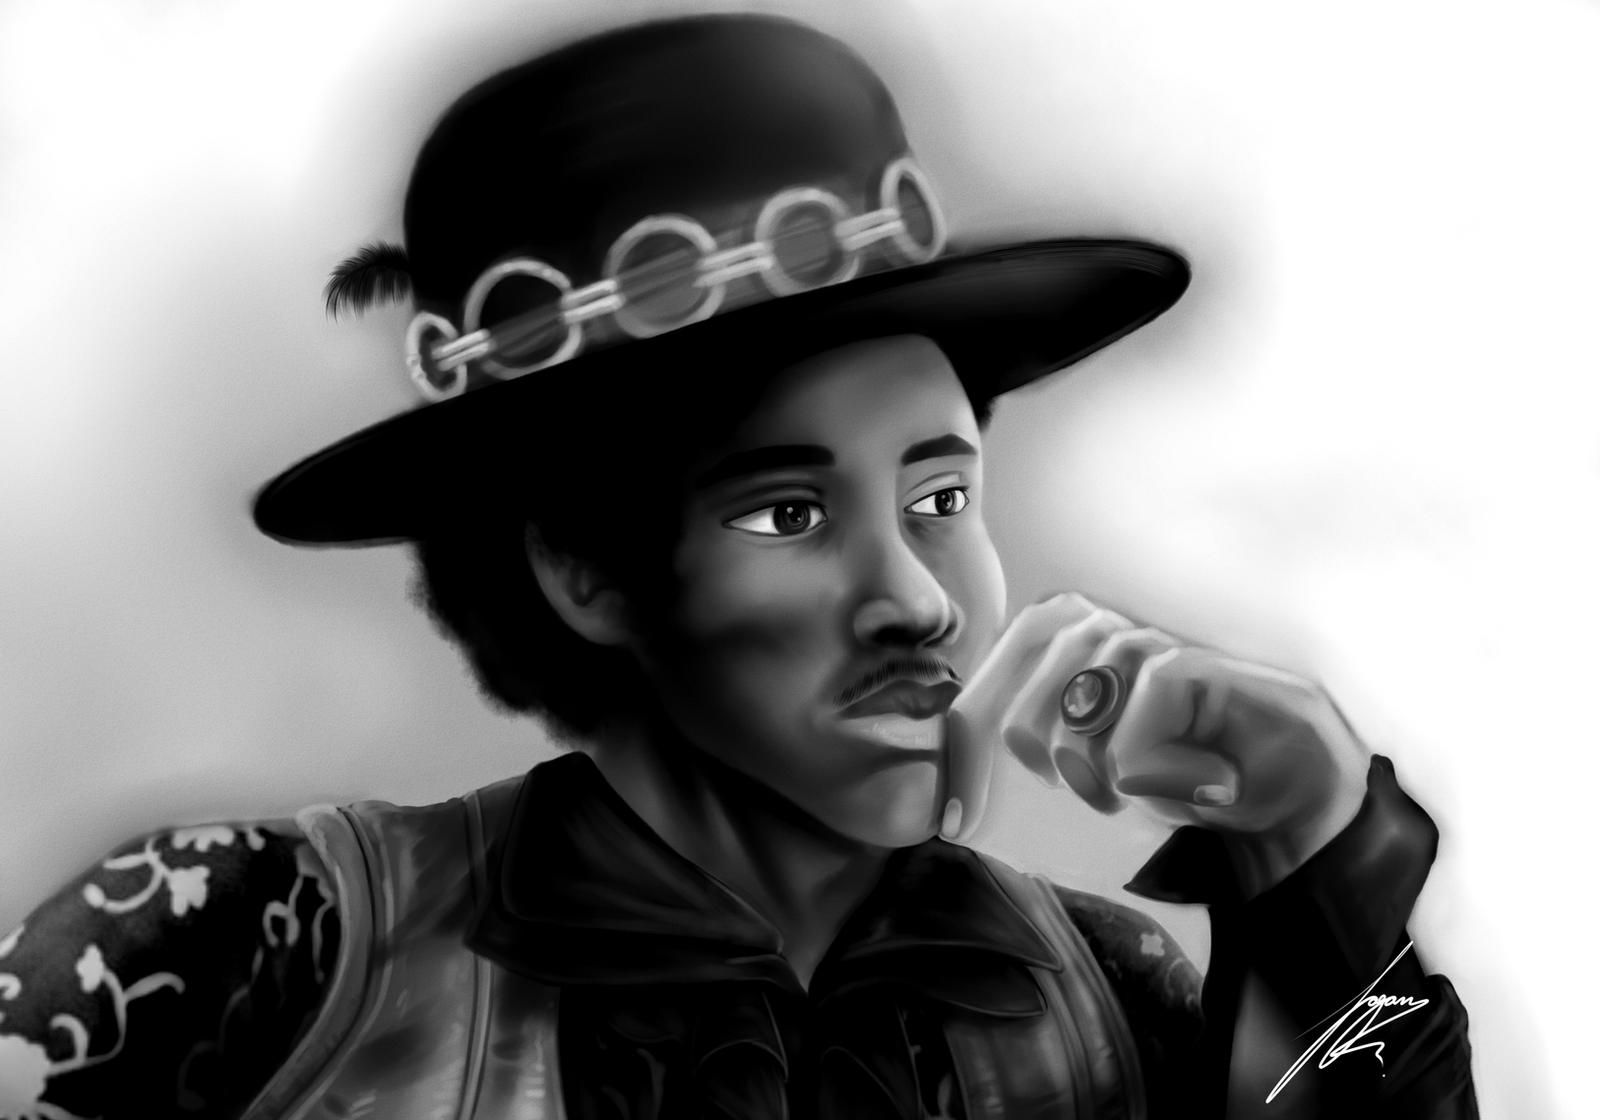 Ole Jimi Portrait by Juacamo